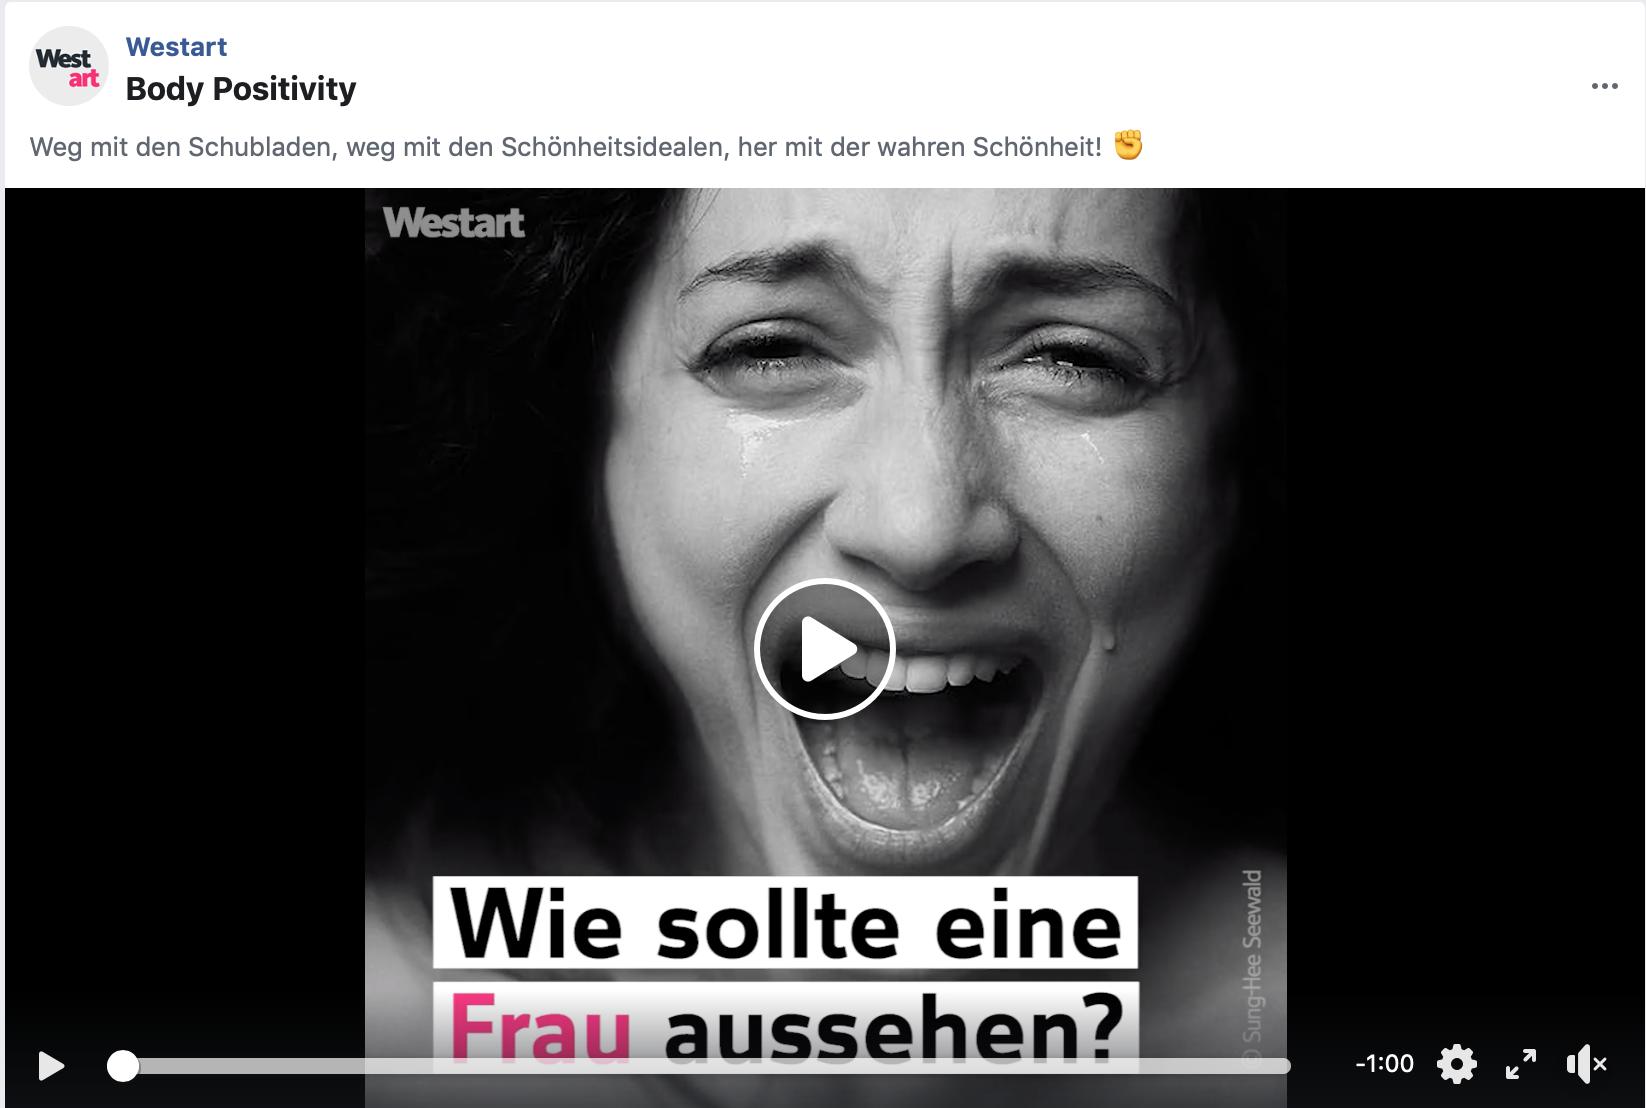 Westart WDR -